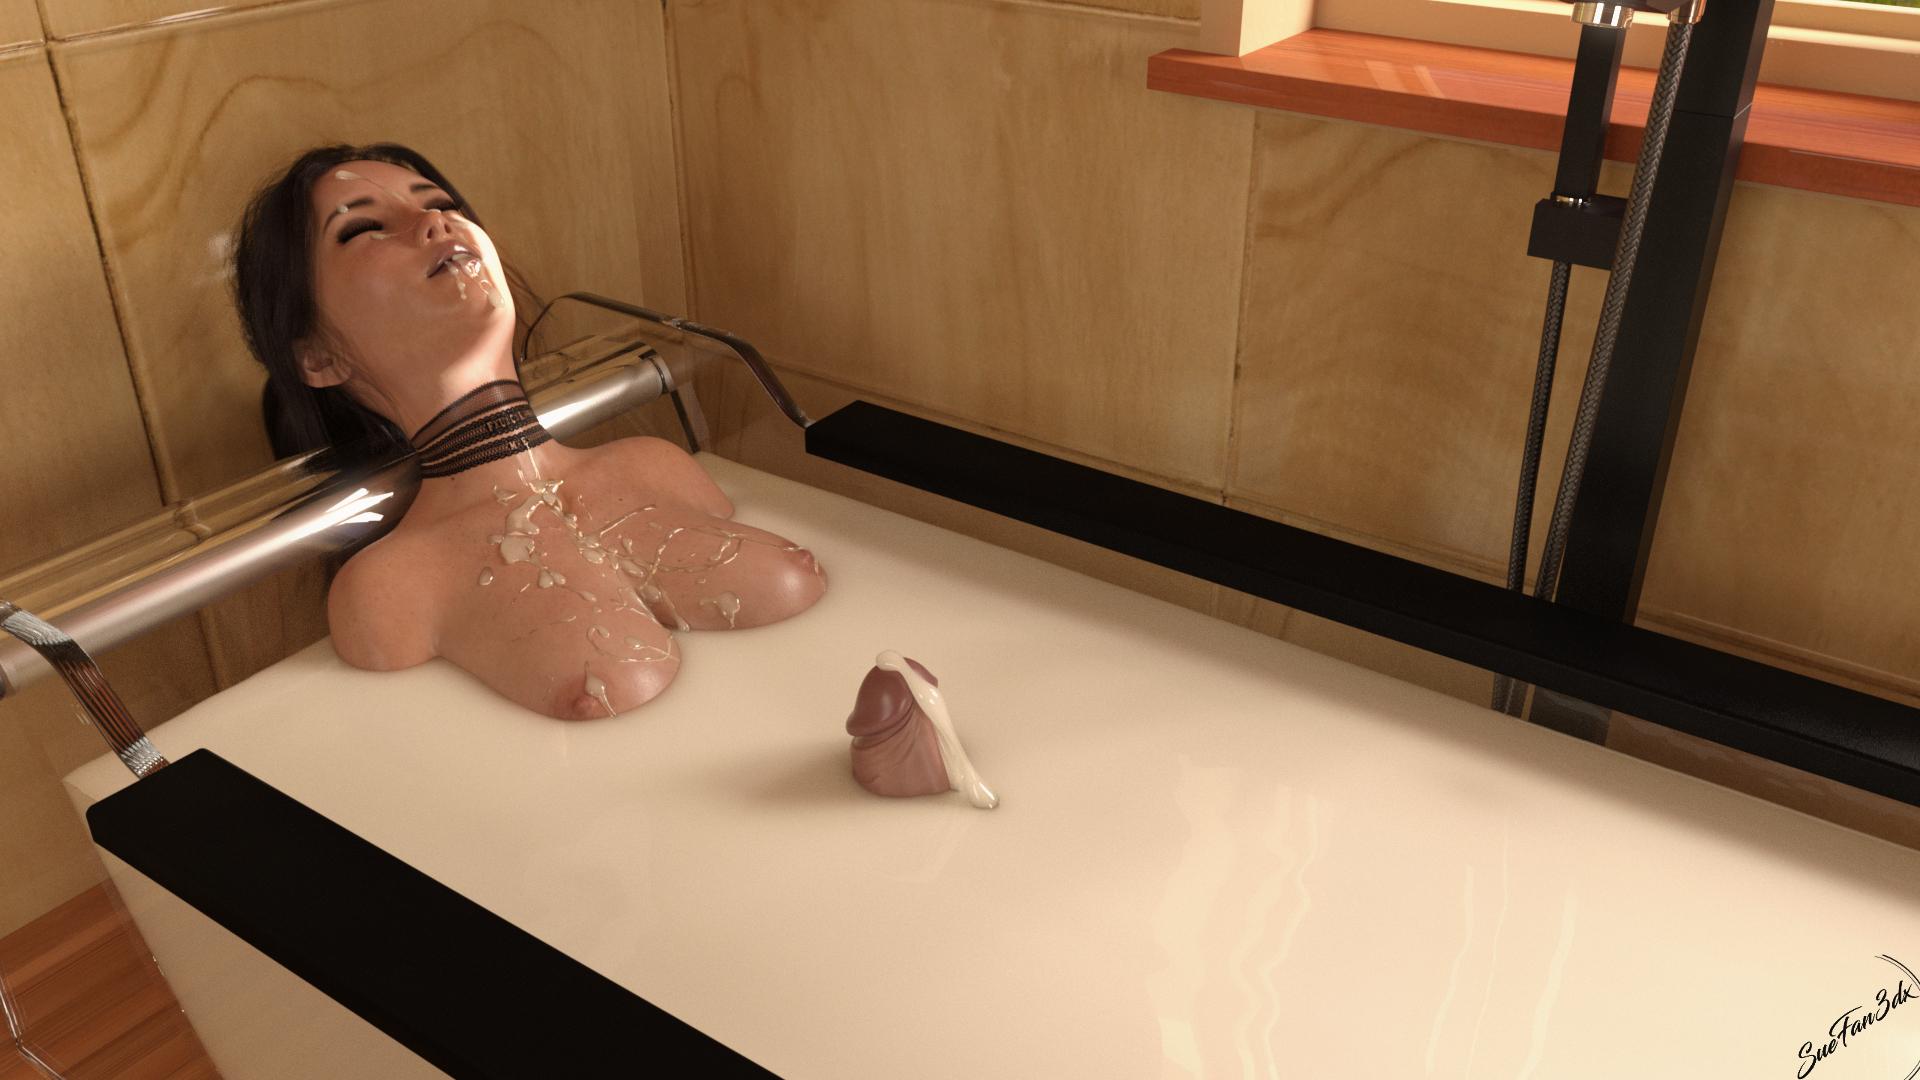 Grace enjoying a nice 'milk' bath